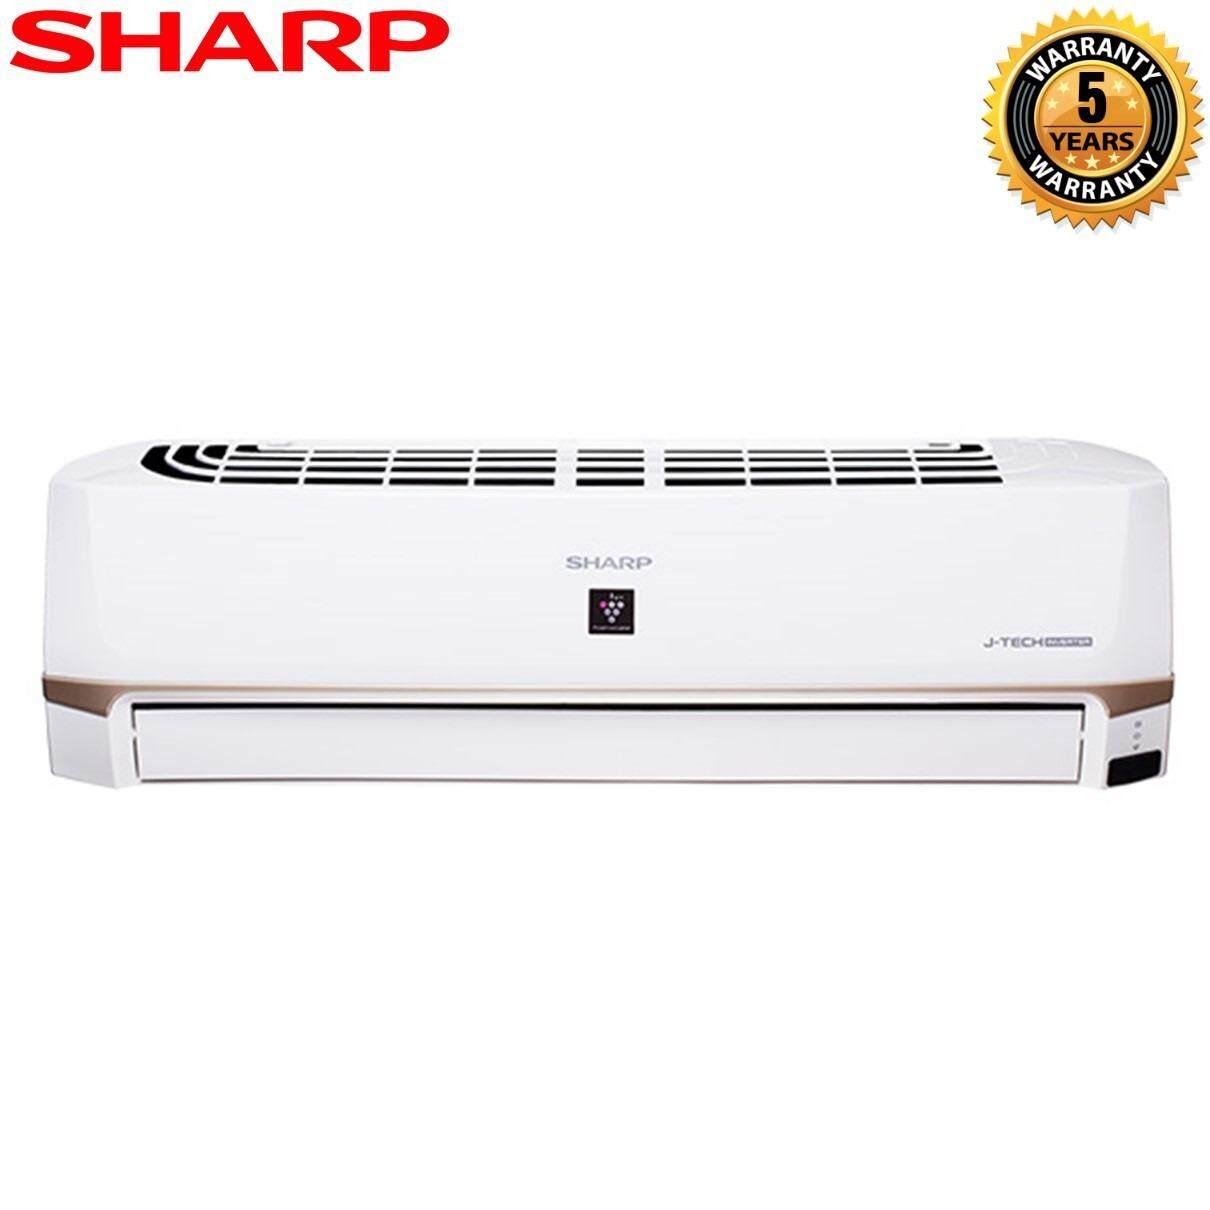 Sharp Plasmacluster J-Tech Inverter Air-Conditioner 2.5hp - AHXP24UHD